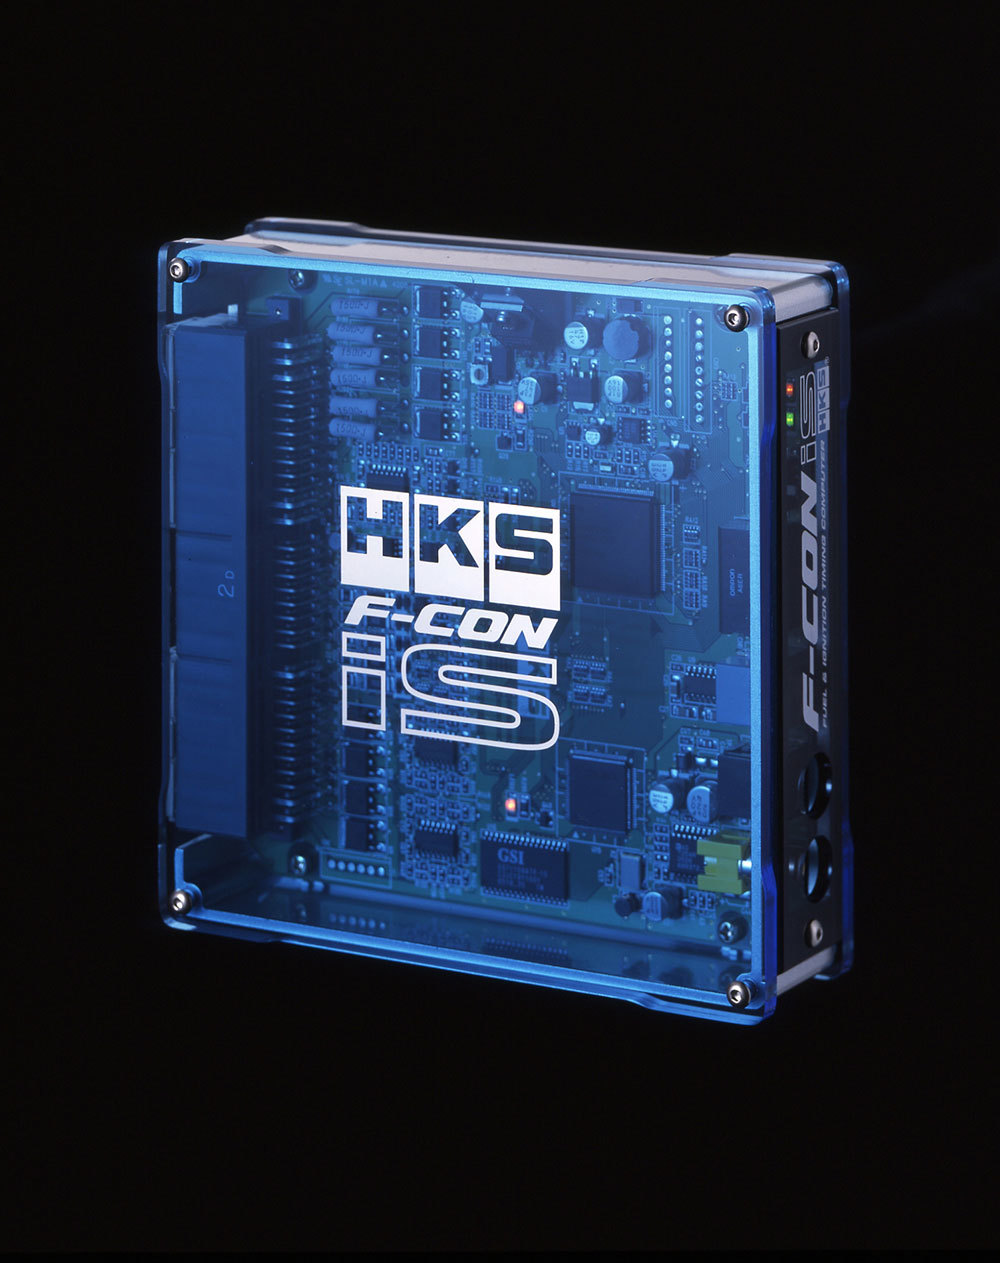 Оригинальный компьютер HKS F-CON iS 42011-AK003